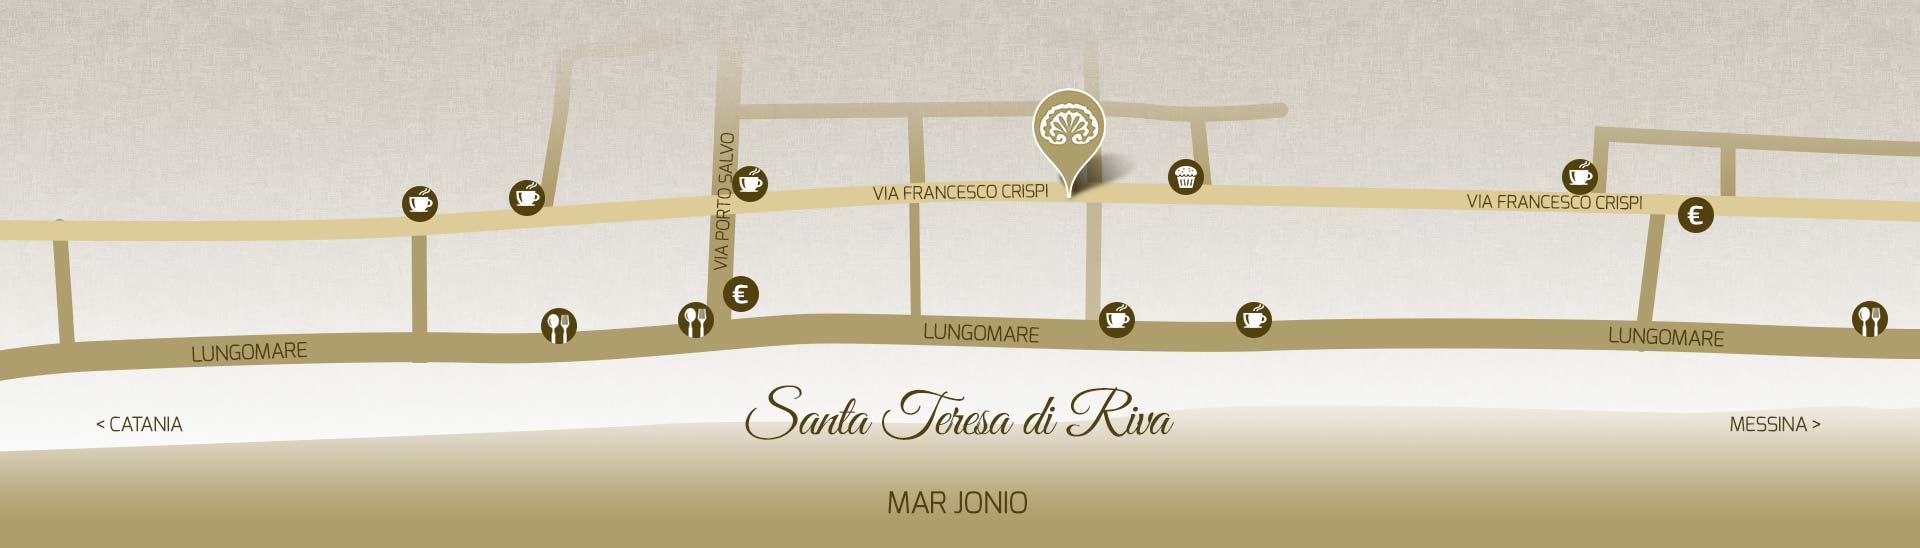 Mappa Villa Teresa B&B Santa Teresa di Riva BANDIERA BLU 2017